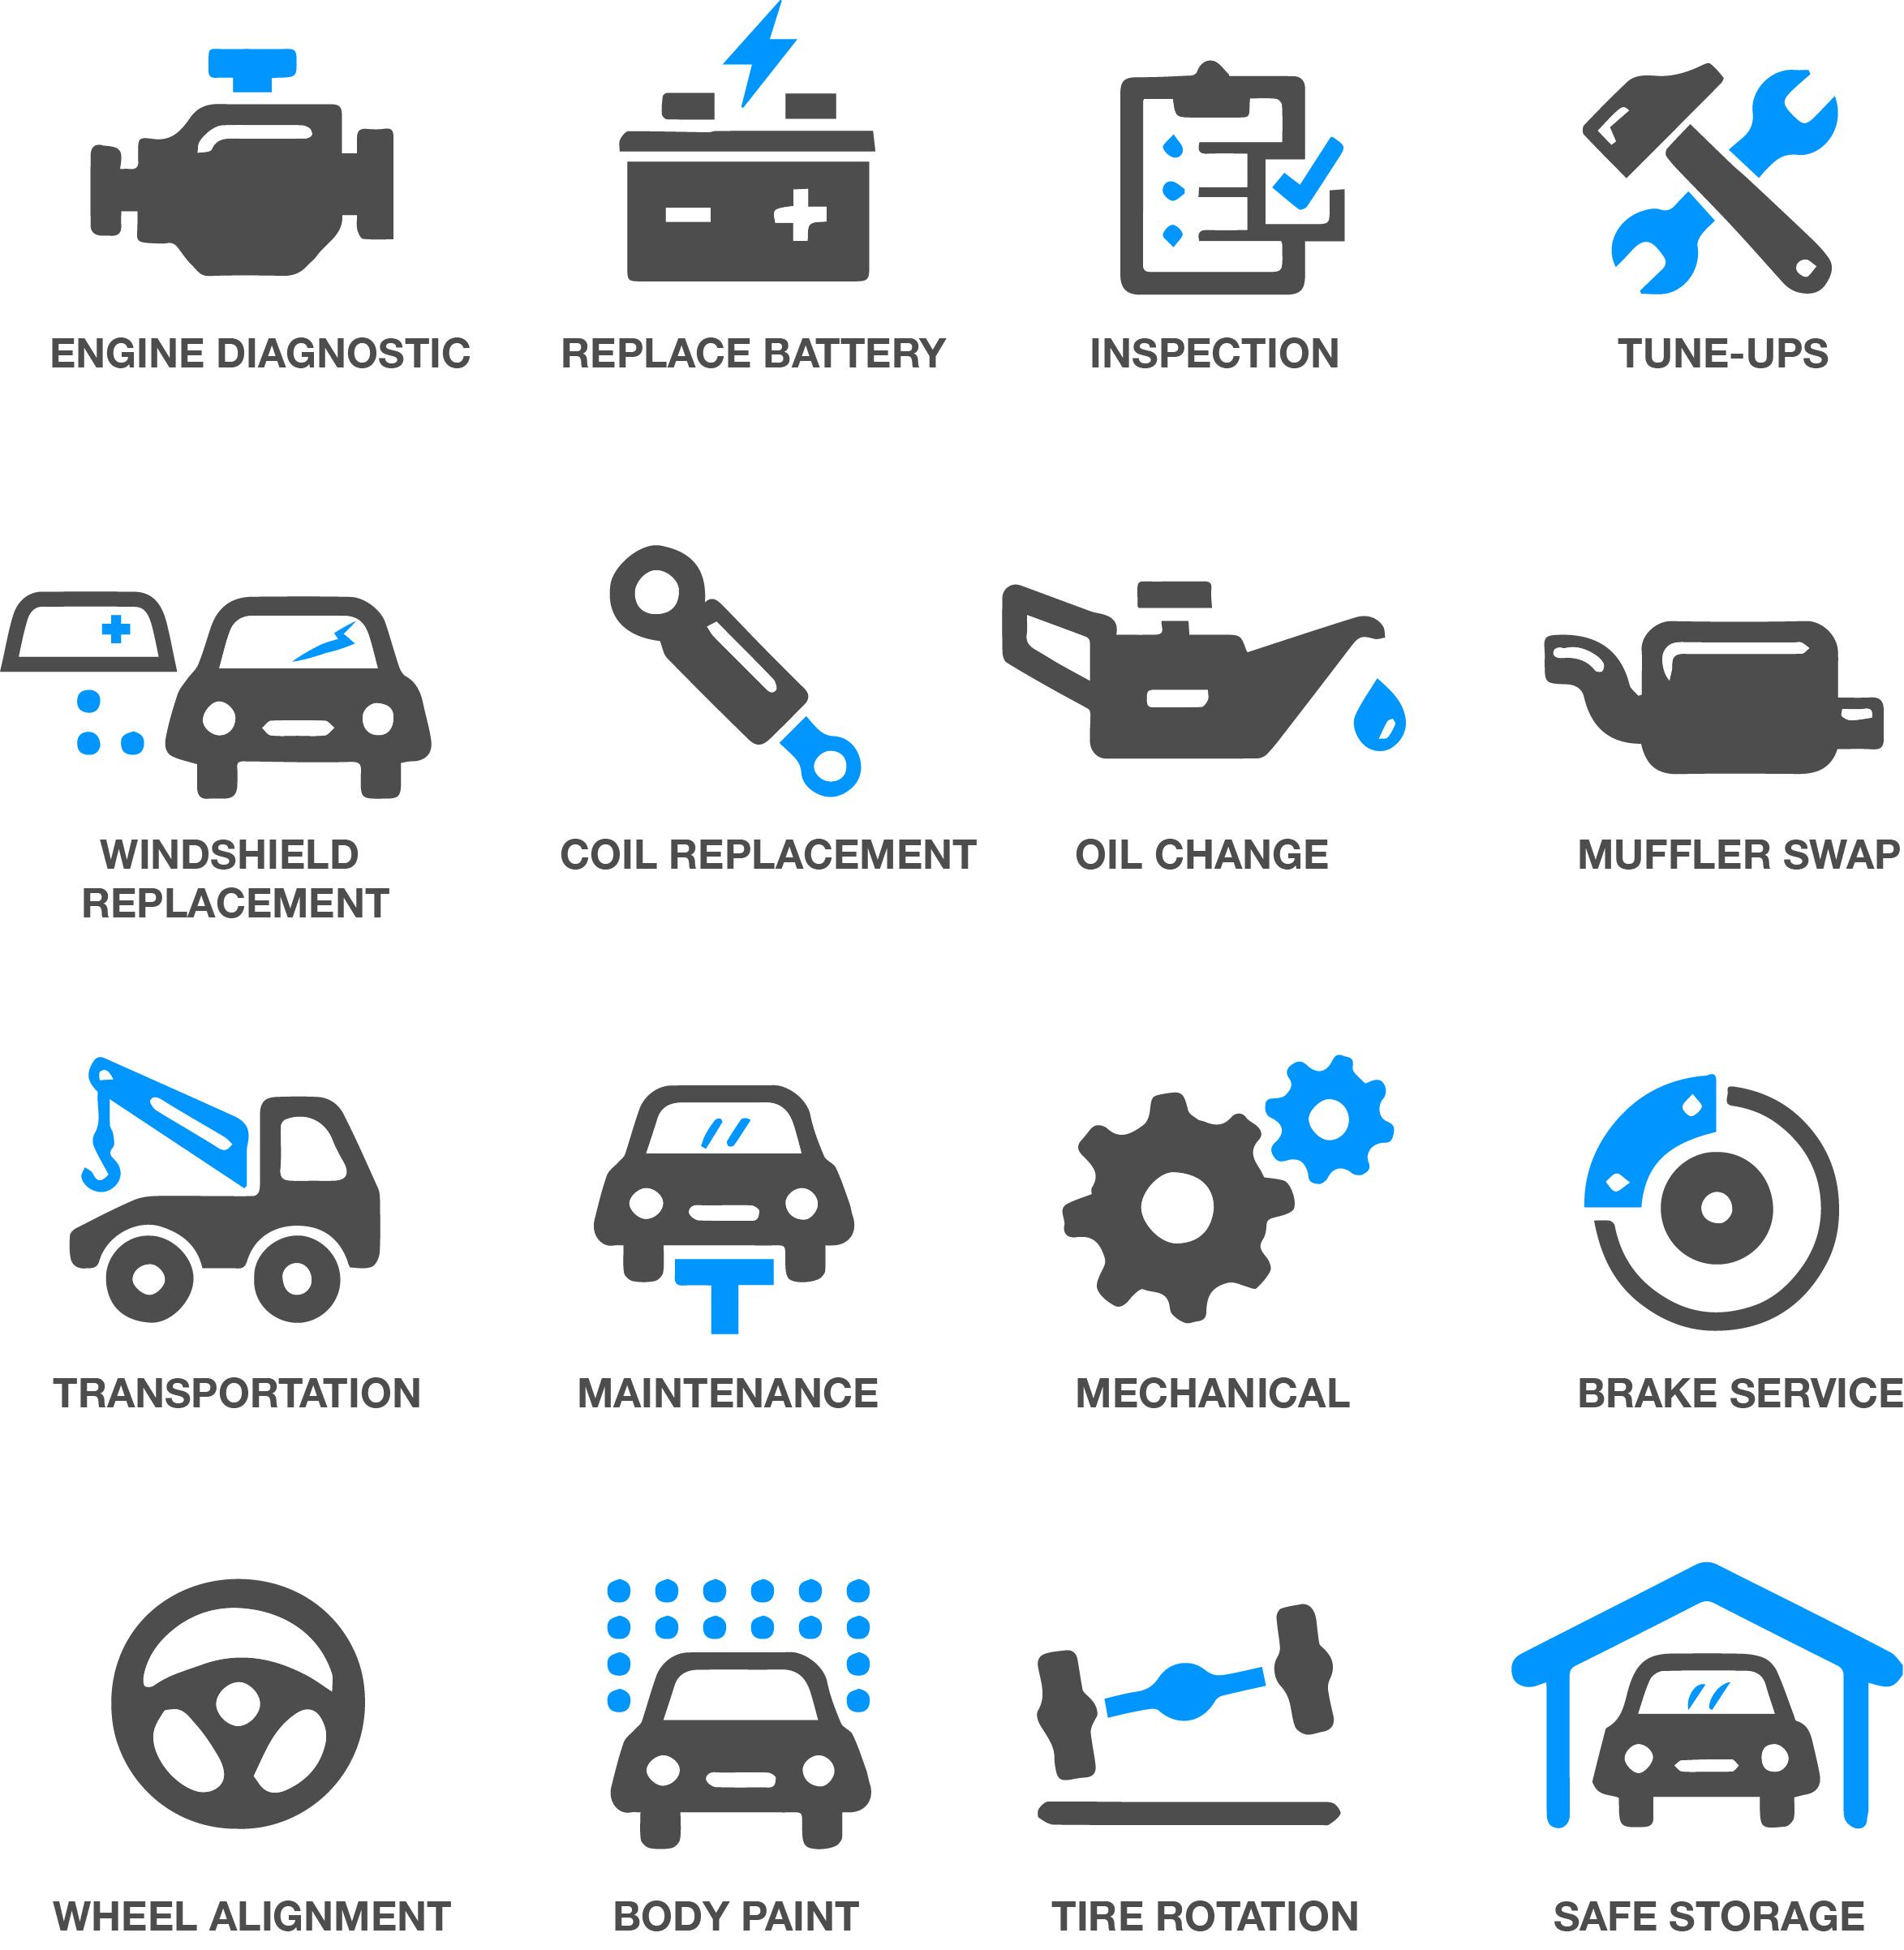 service symbols.jpg